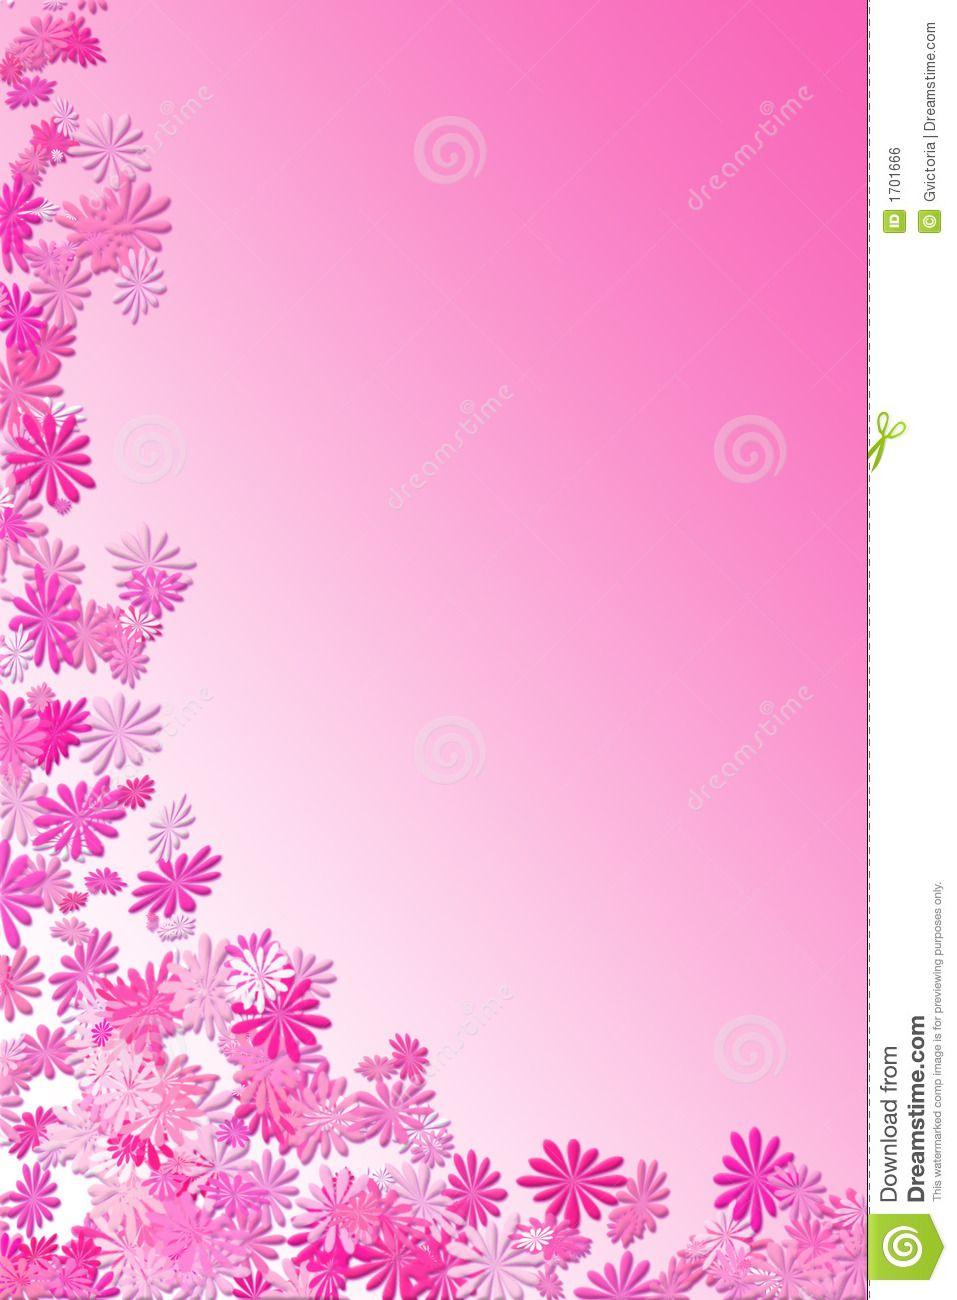 Pink Daisy Frame Royalty Free Stock Image - Image: 1701666